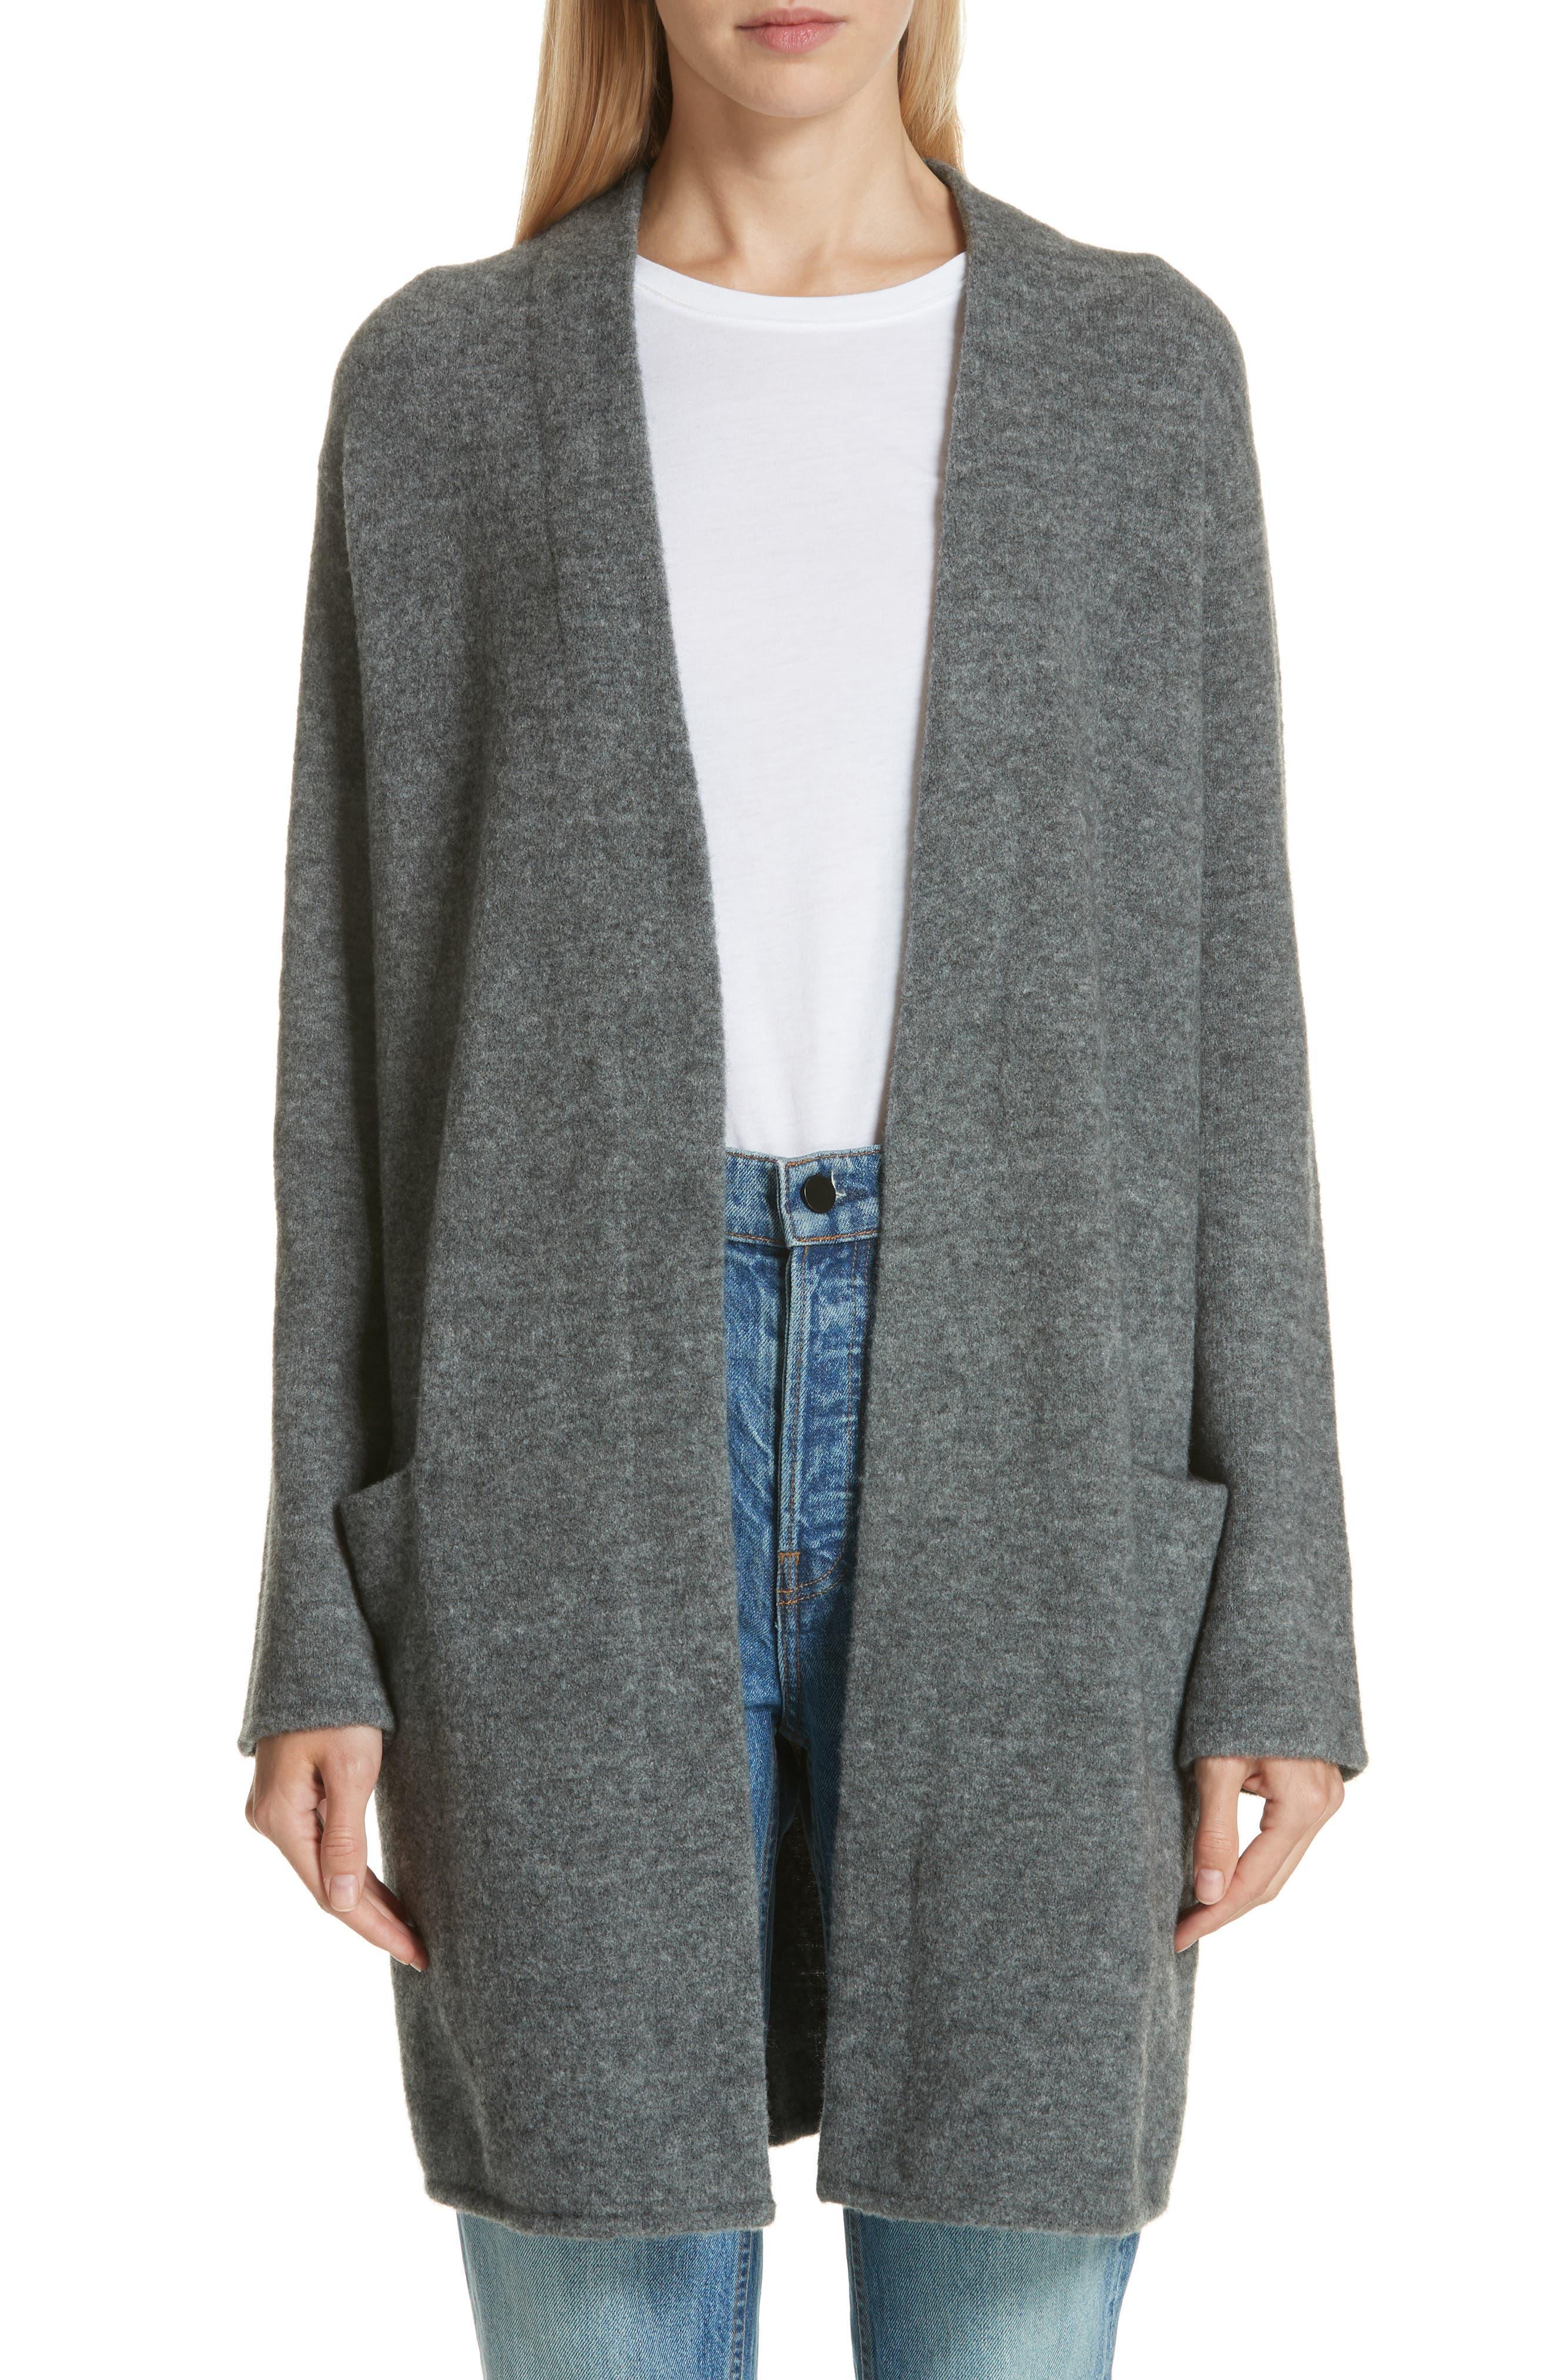 JENNI KAYNE Open Sweater Coat in Grey